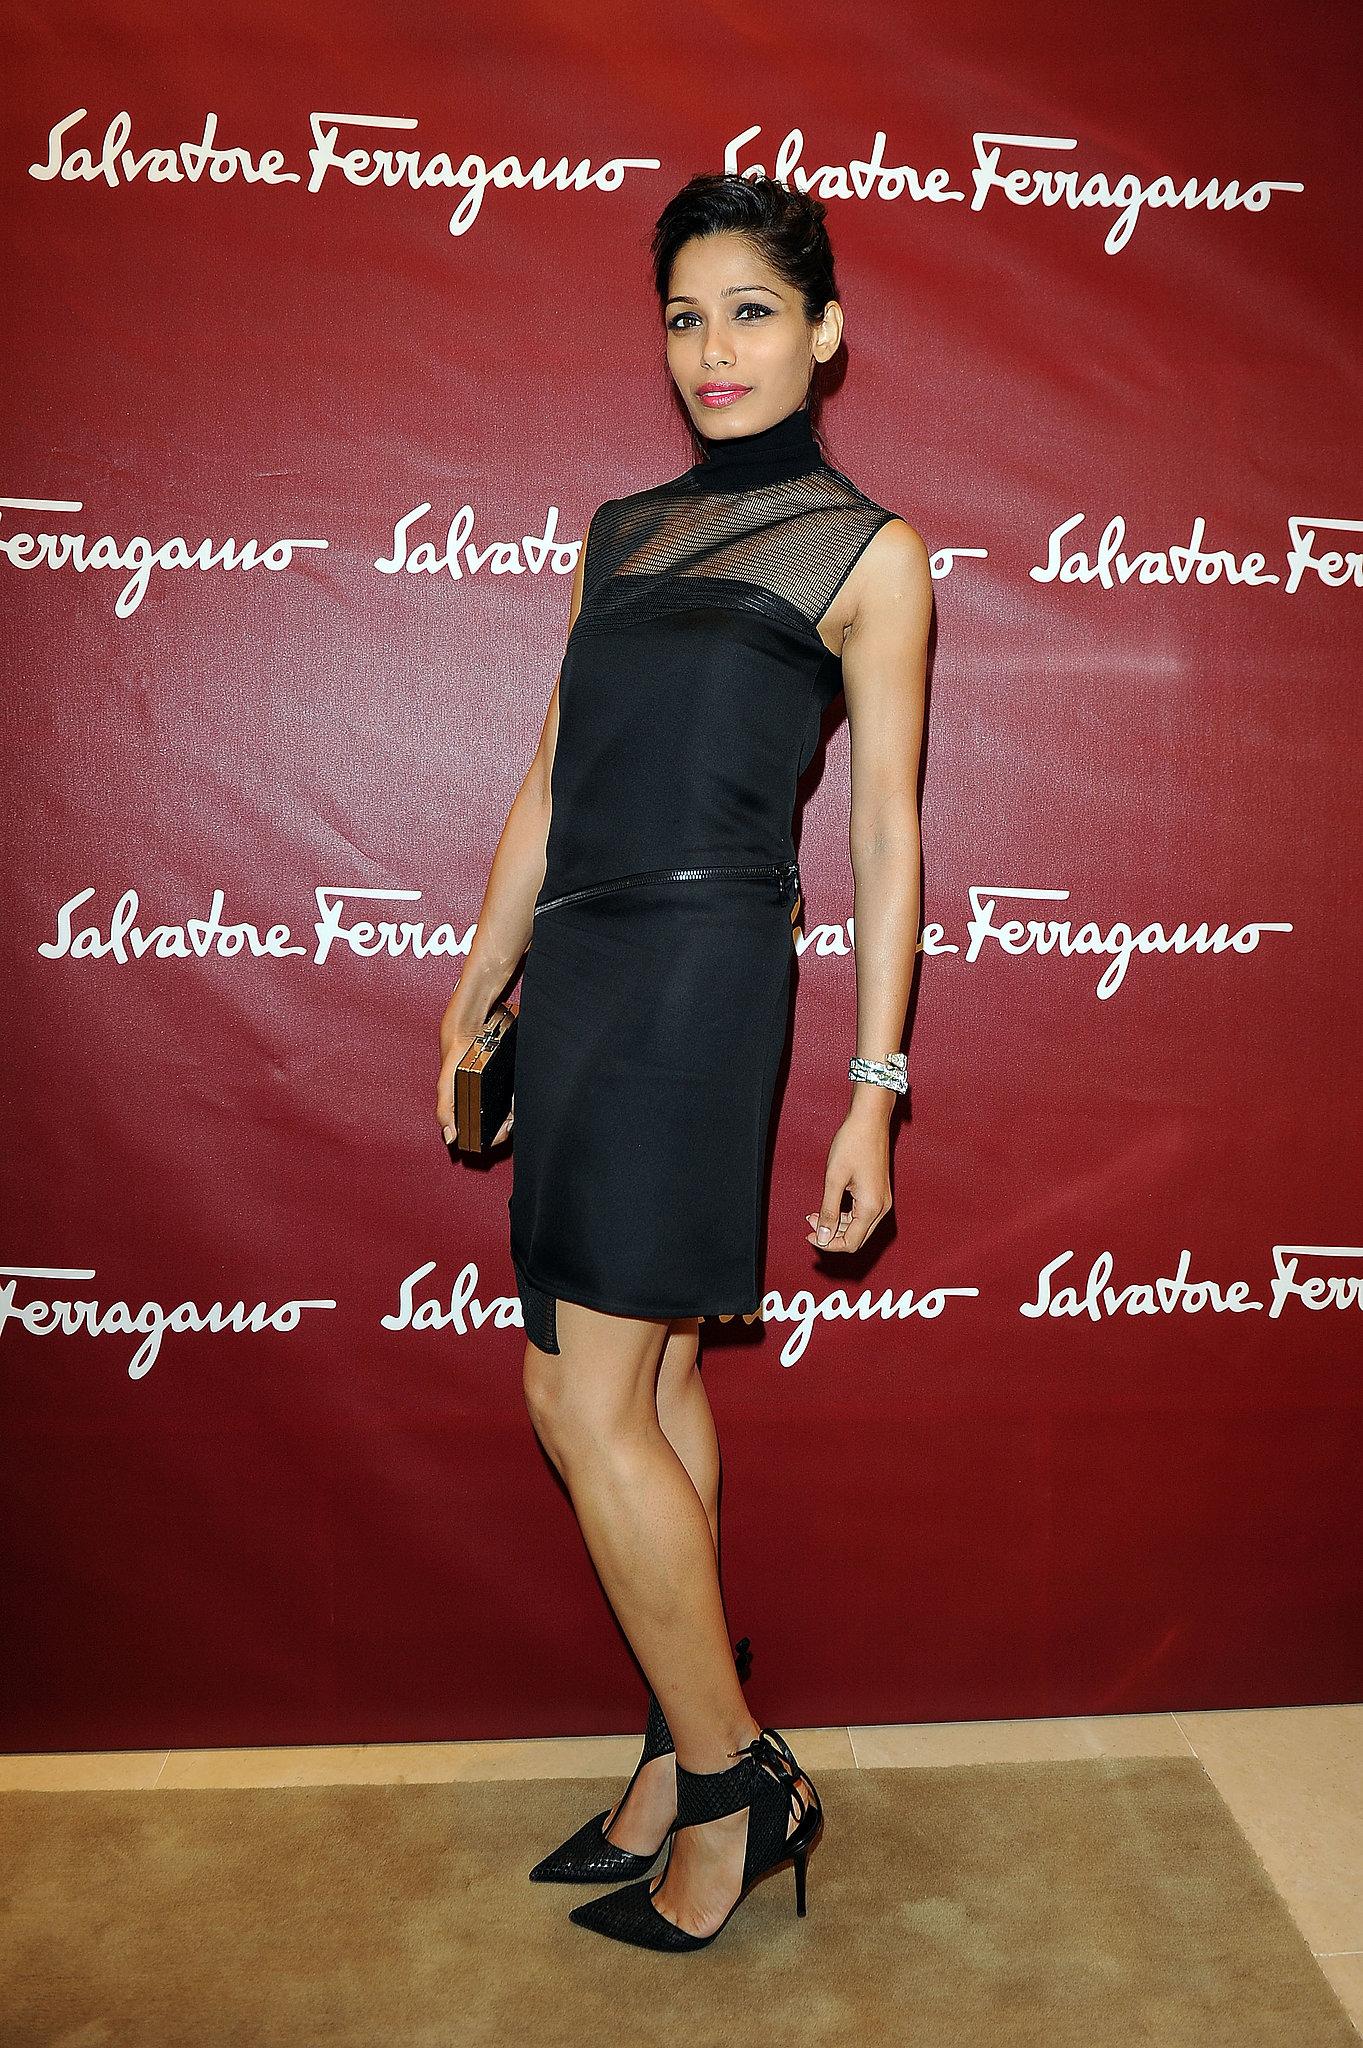 Freida Pinto wore black on Friday at a Salvatore Ferragamo store opening.